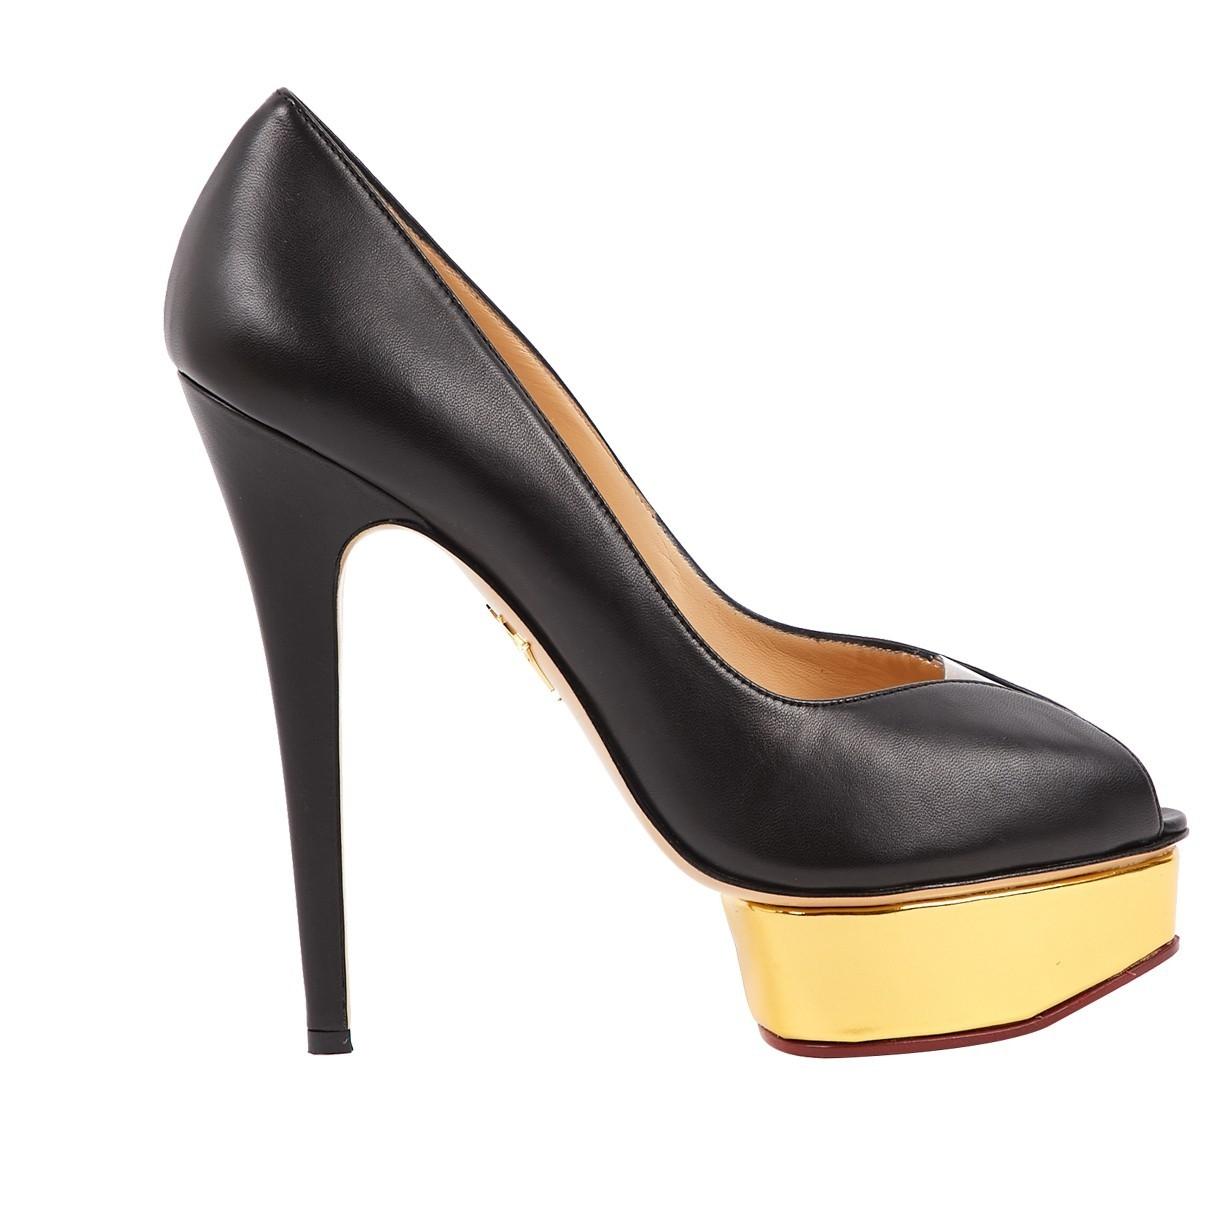 Charlotte Olympia \N Black Leather Heels for Women 39.5 EU